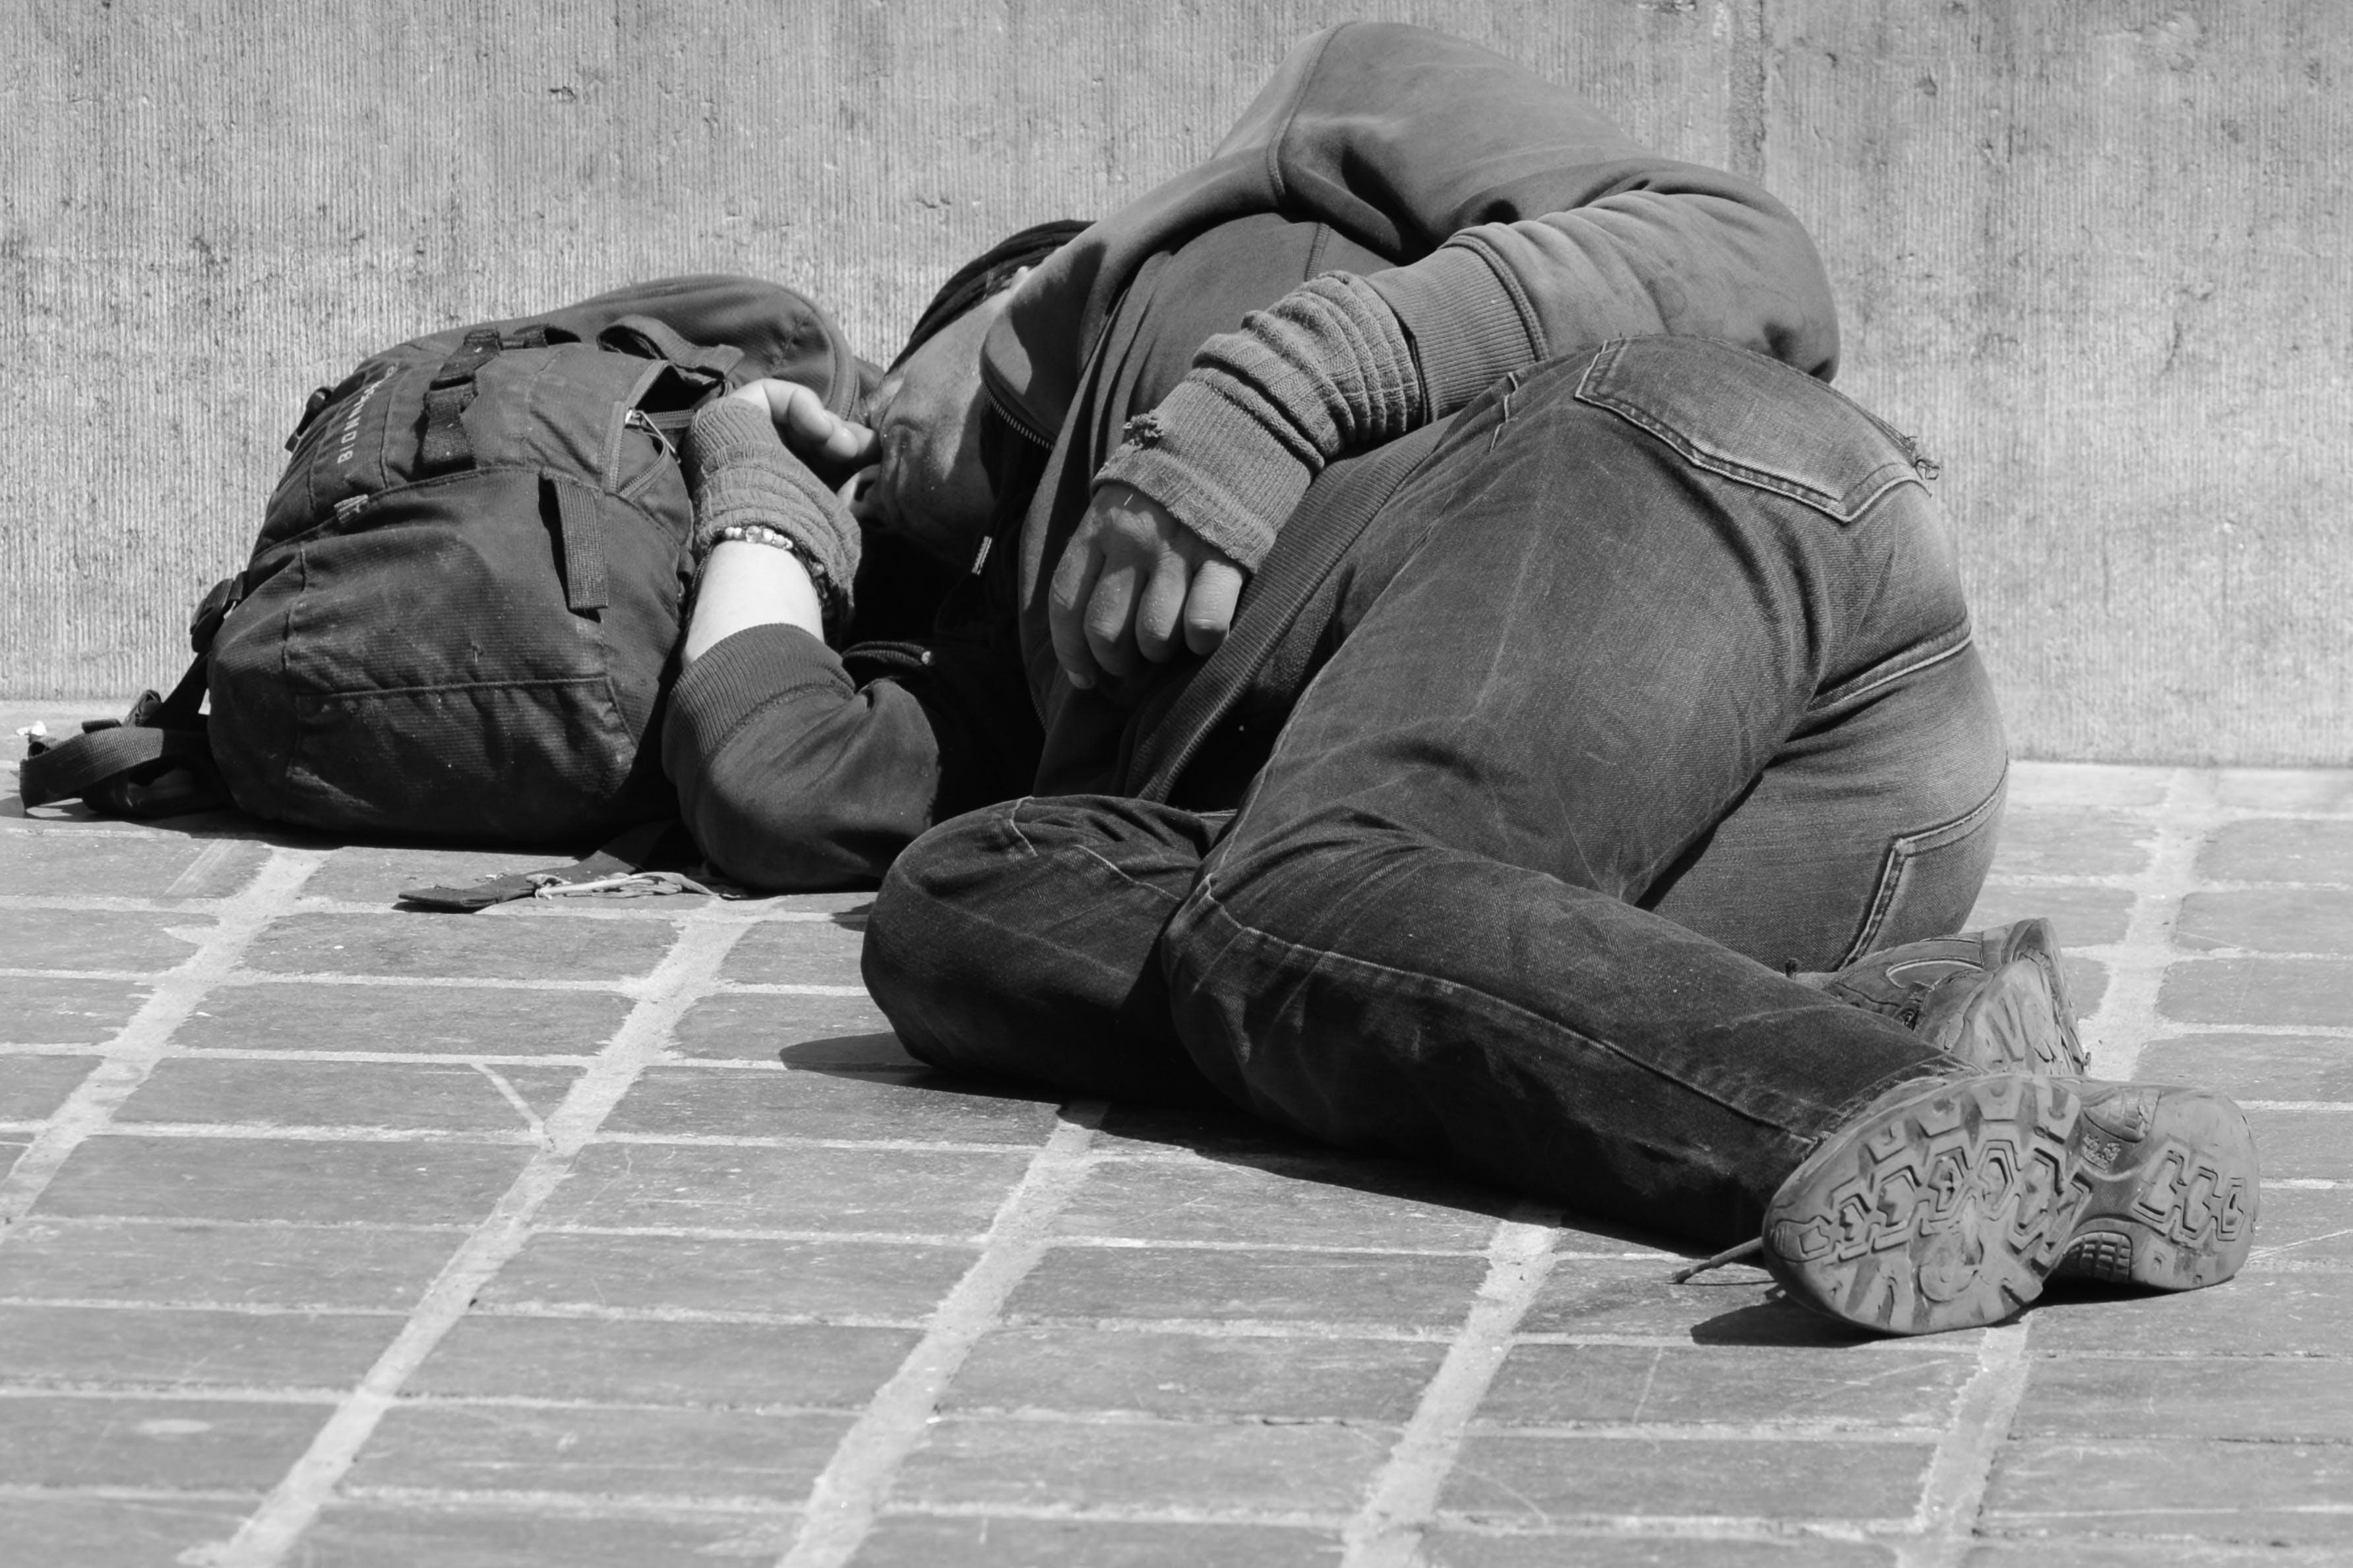 homeless, man, people